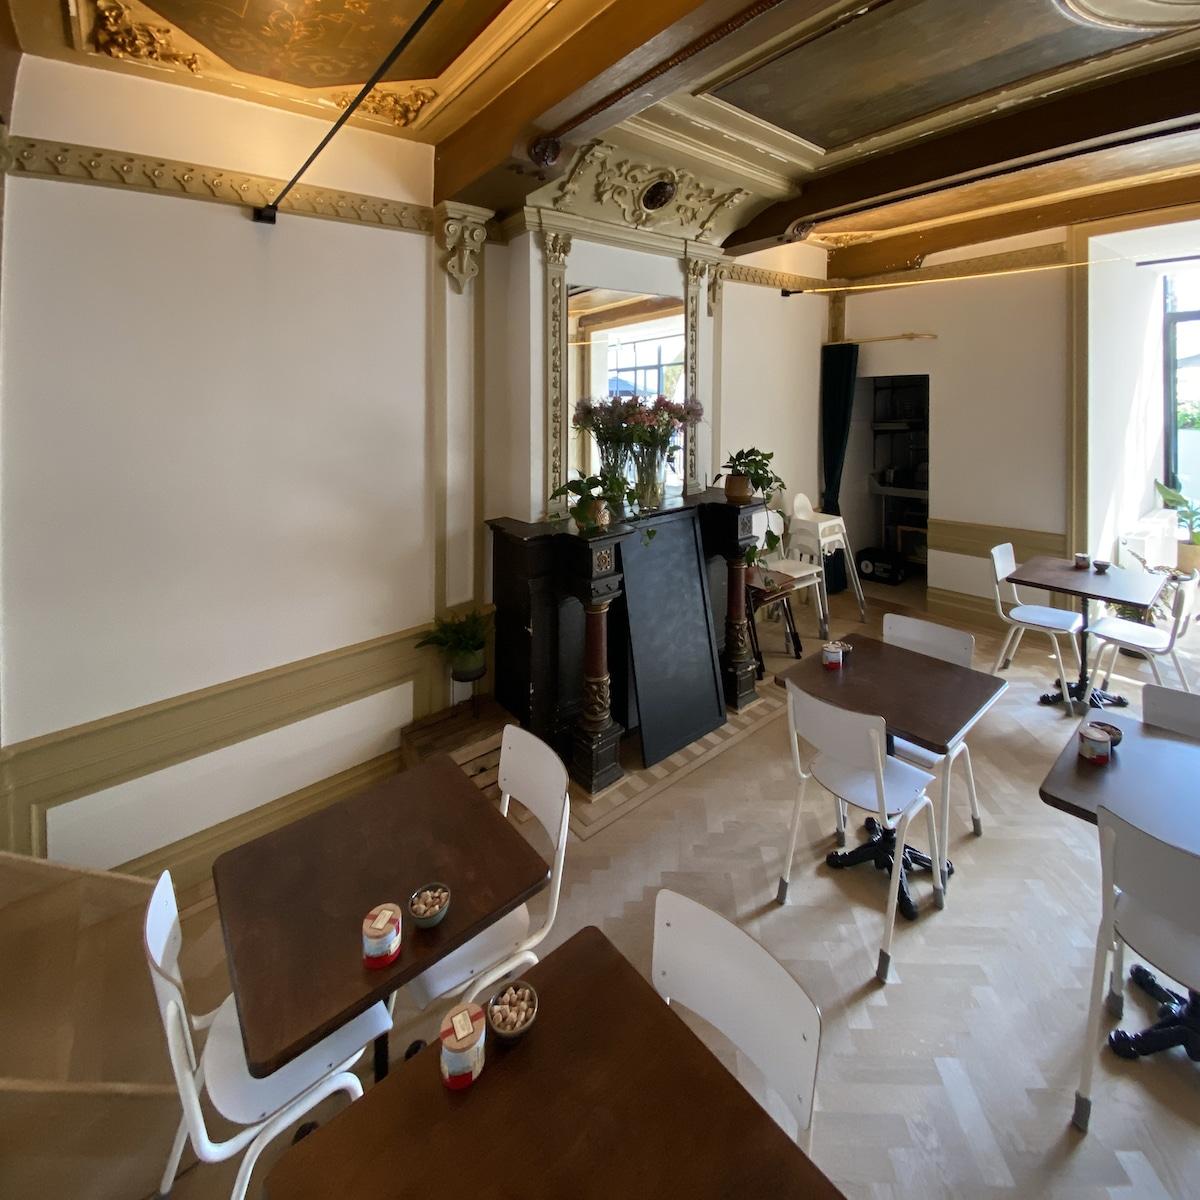 IMG 8157 2 | Baeyens & Beck architecten Gent | architect nieuwbouw renovatie interieur | high end | architectenbureau